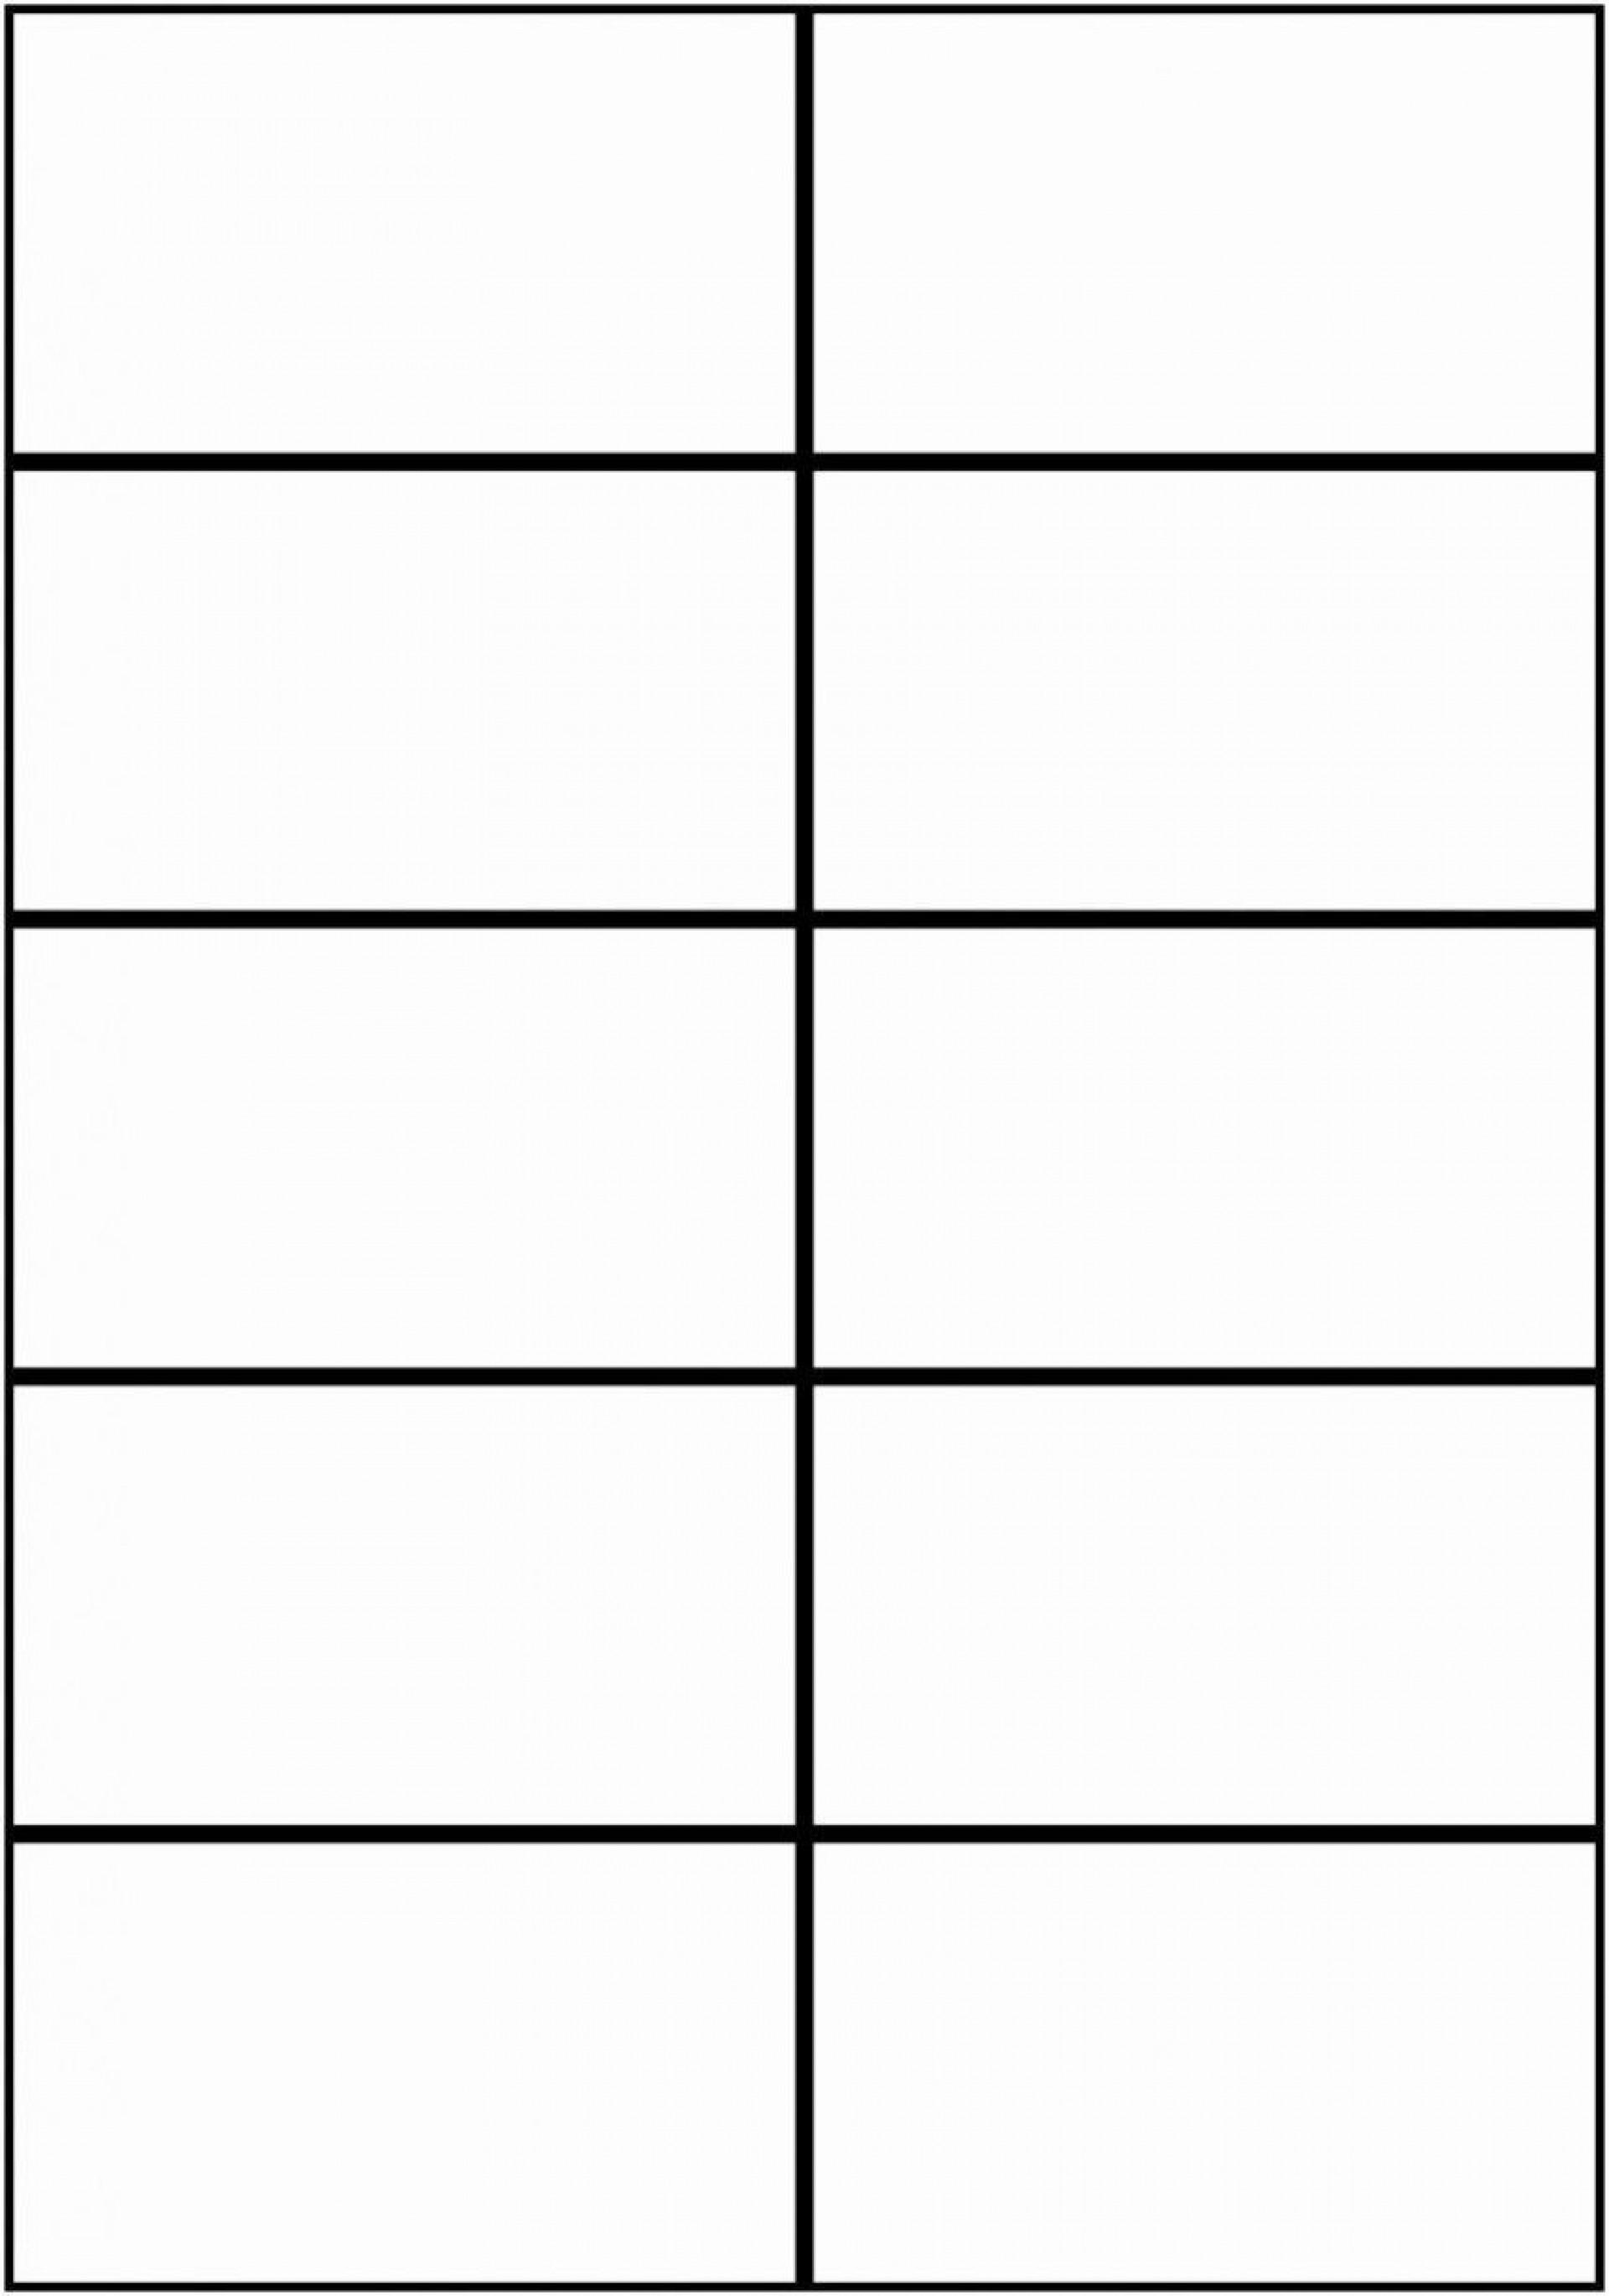 004 Singular Blank Busines Card Template Word High Resolution  Vertical Microsoft 2013 Avery1920